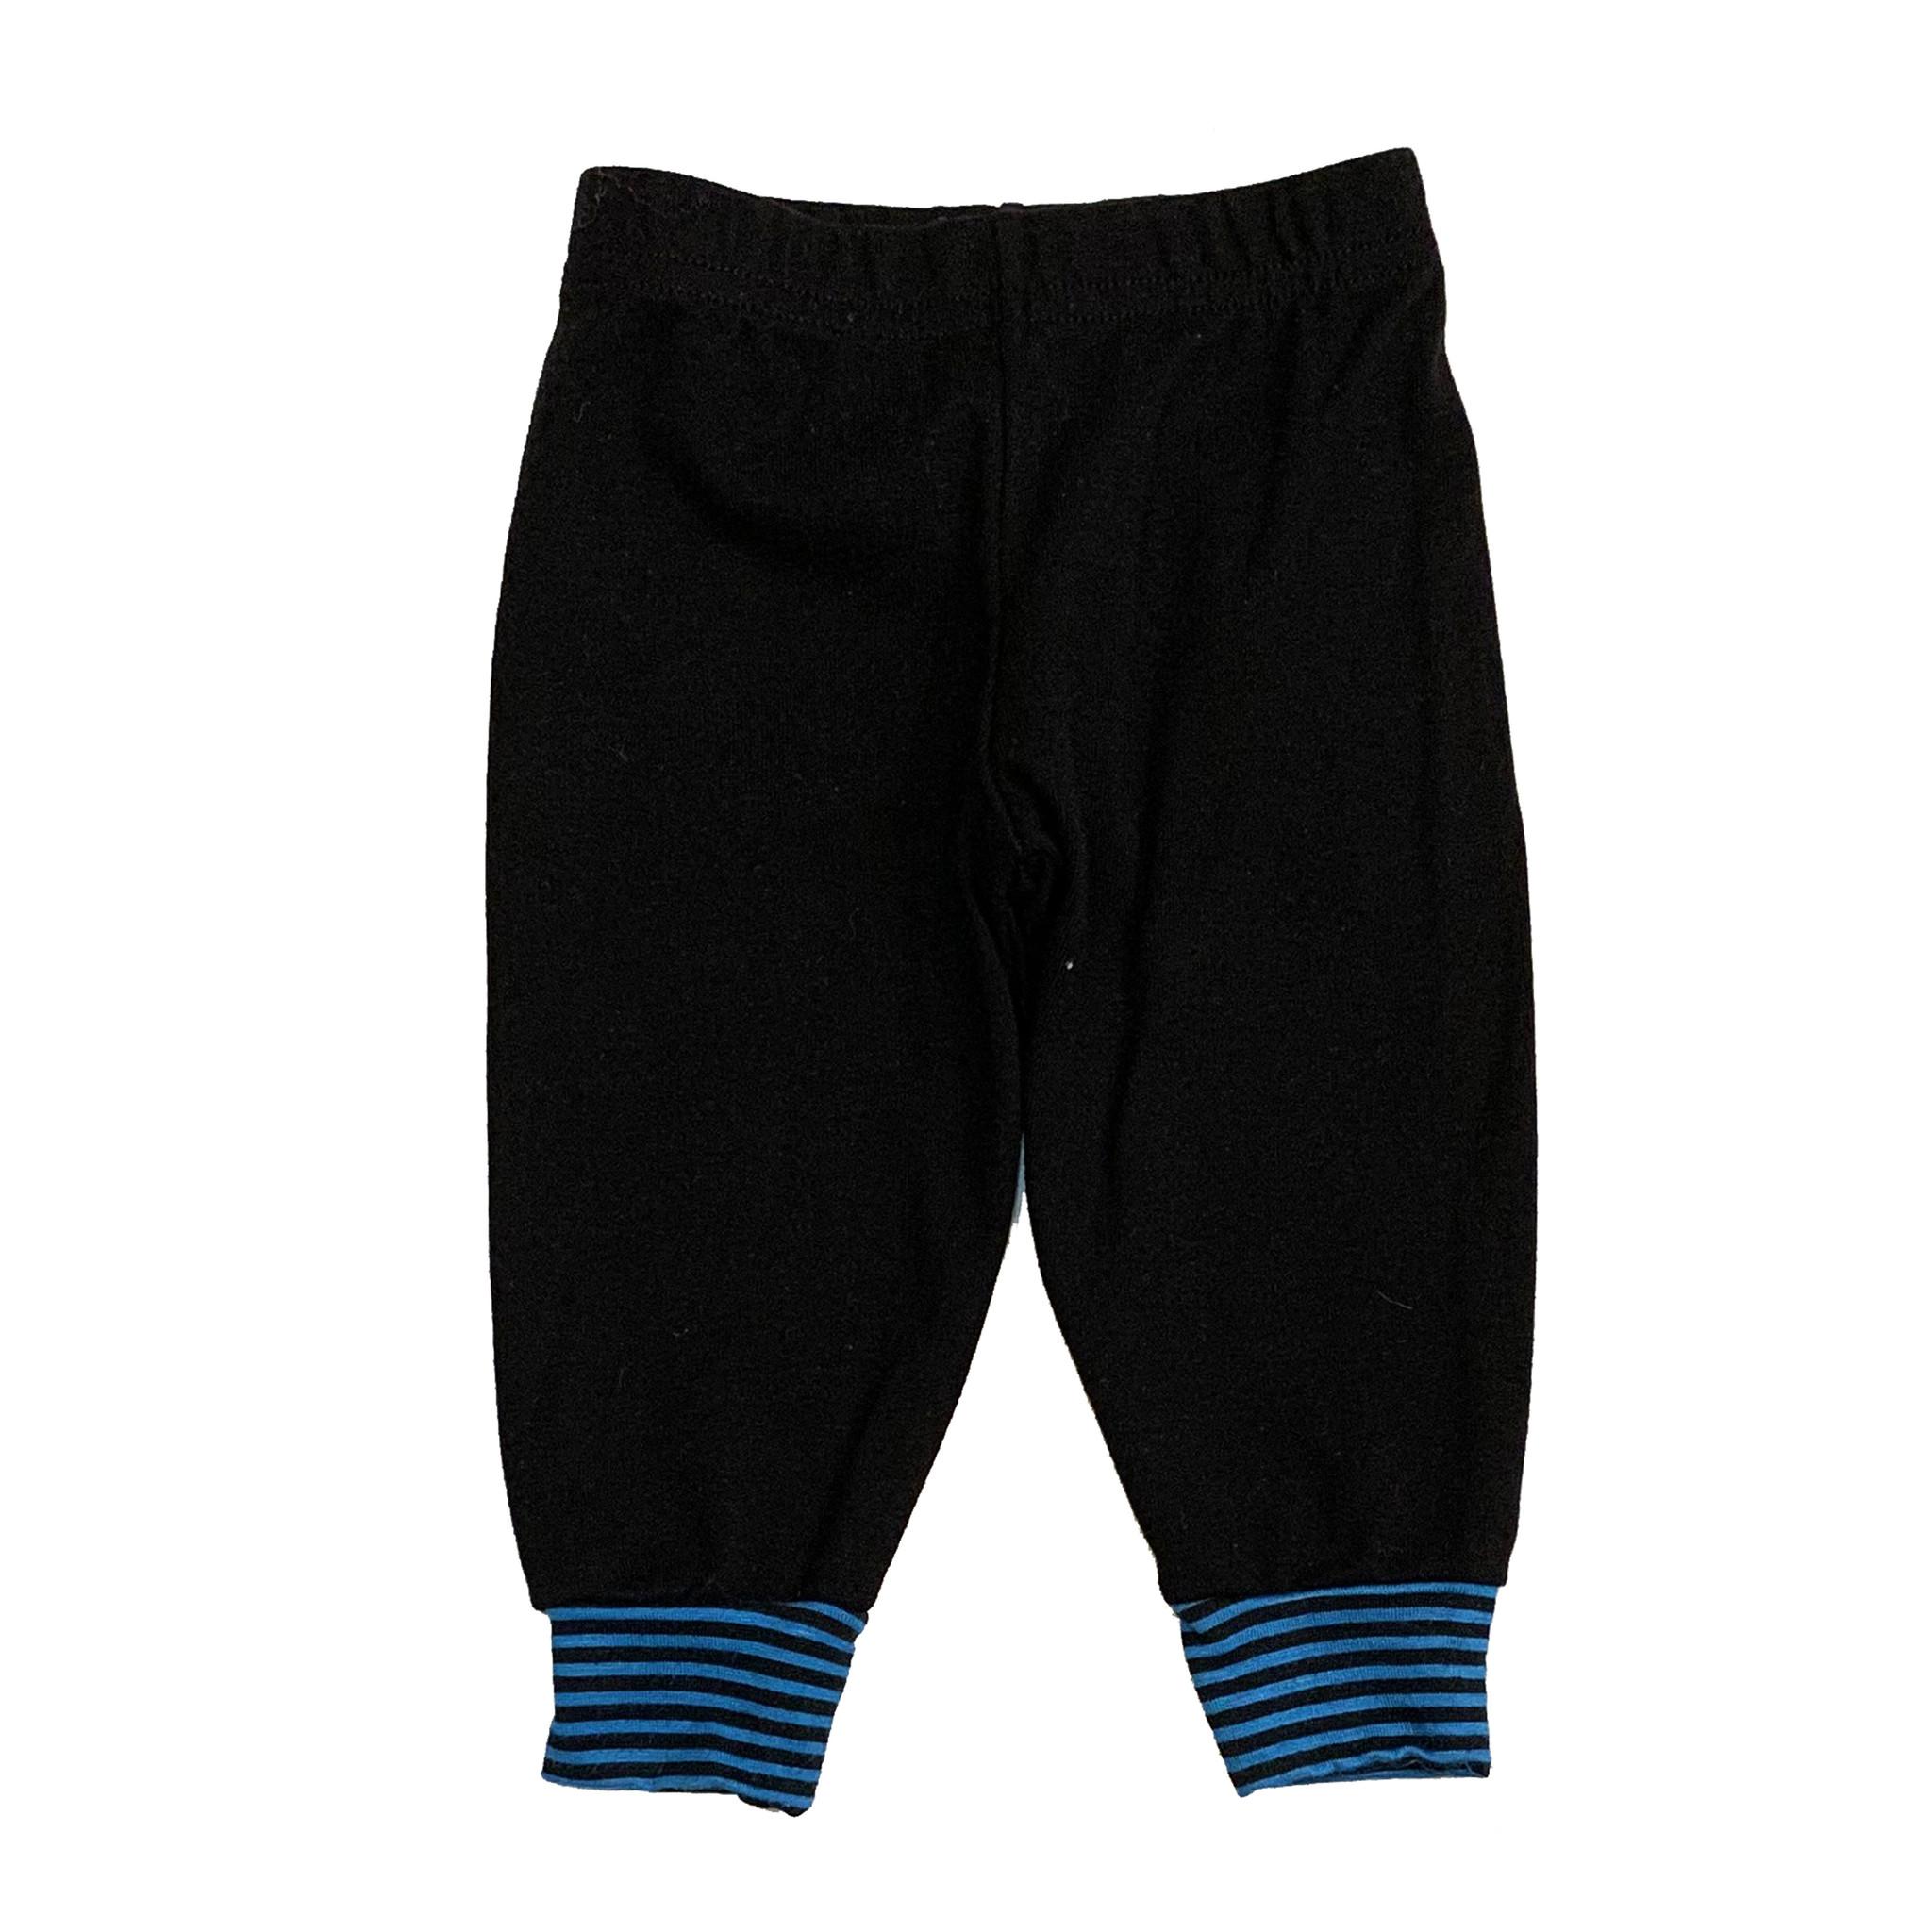 Small Change Turquoise Stripe Cuff Pant